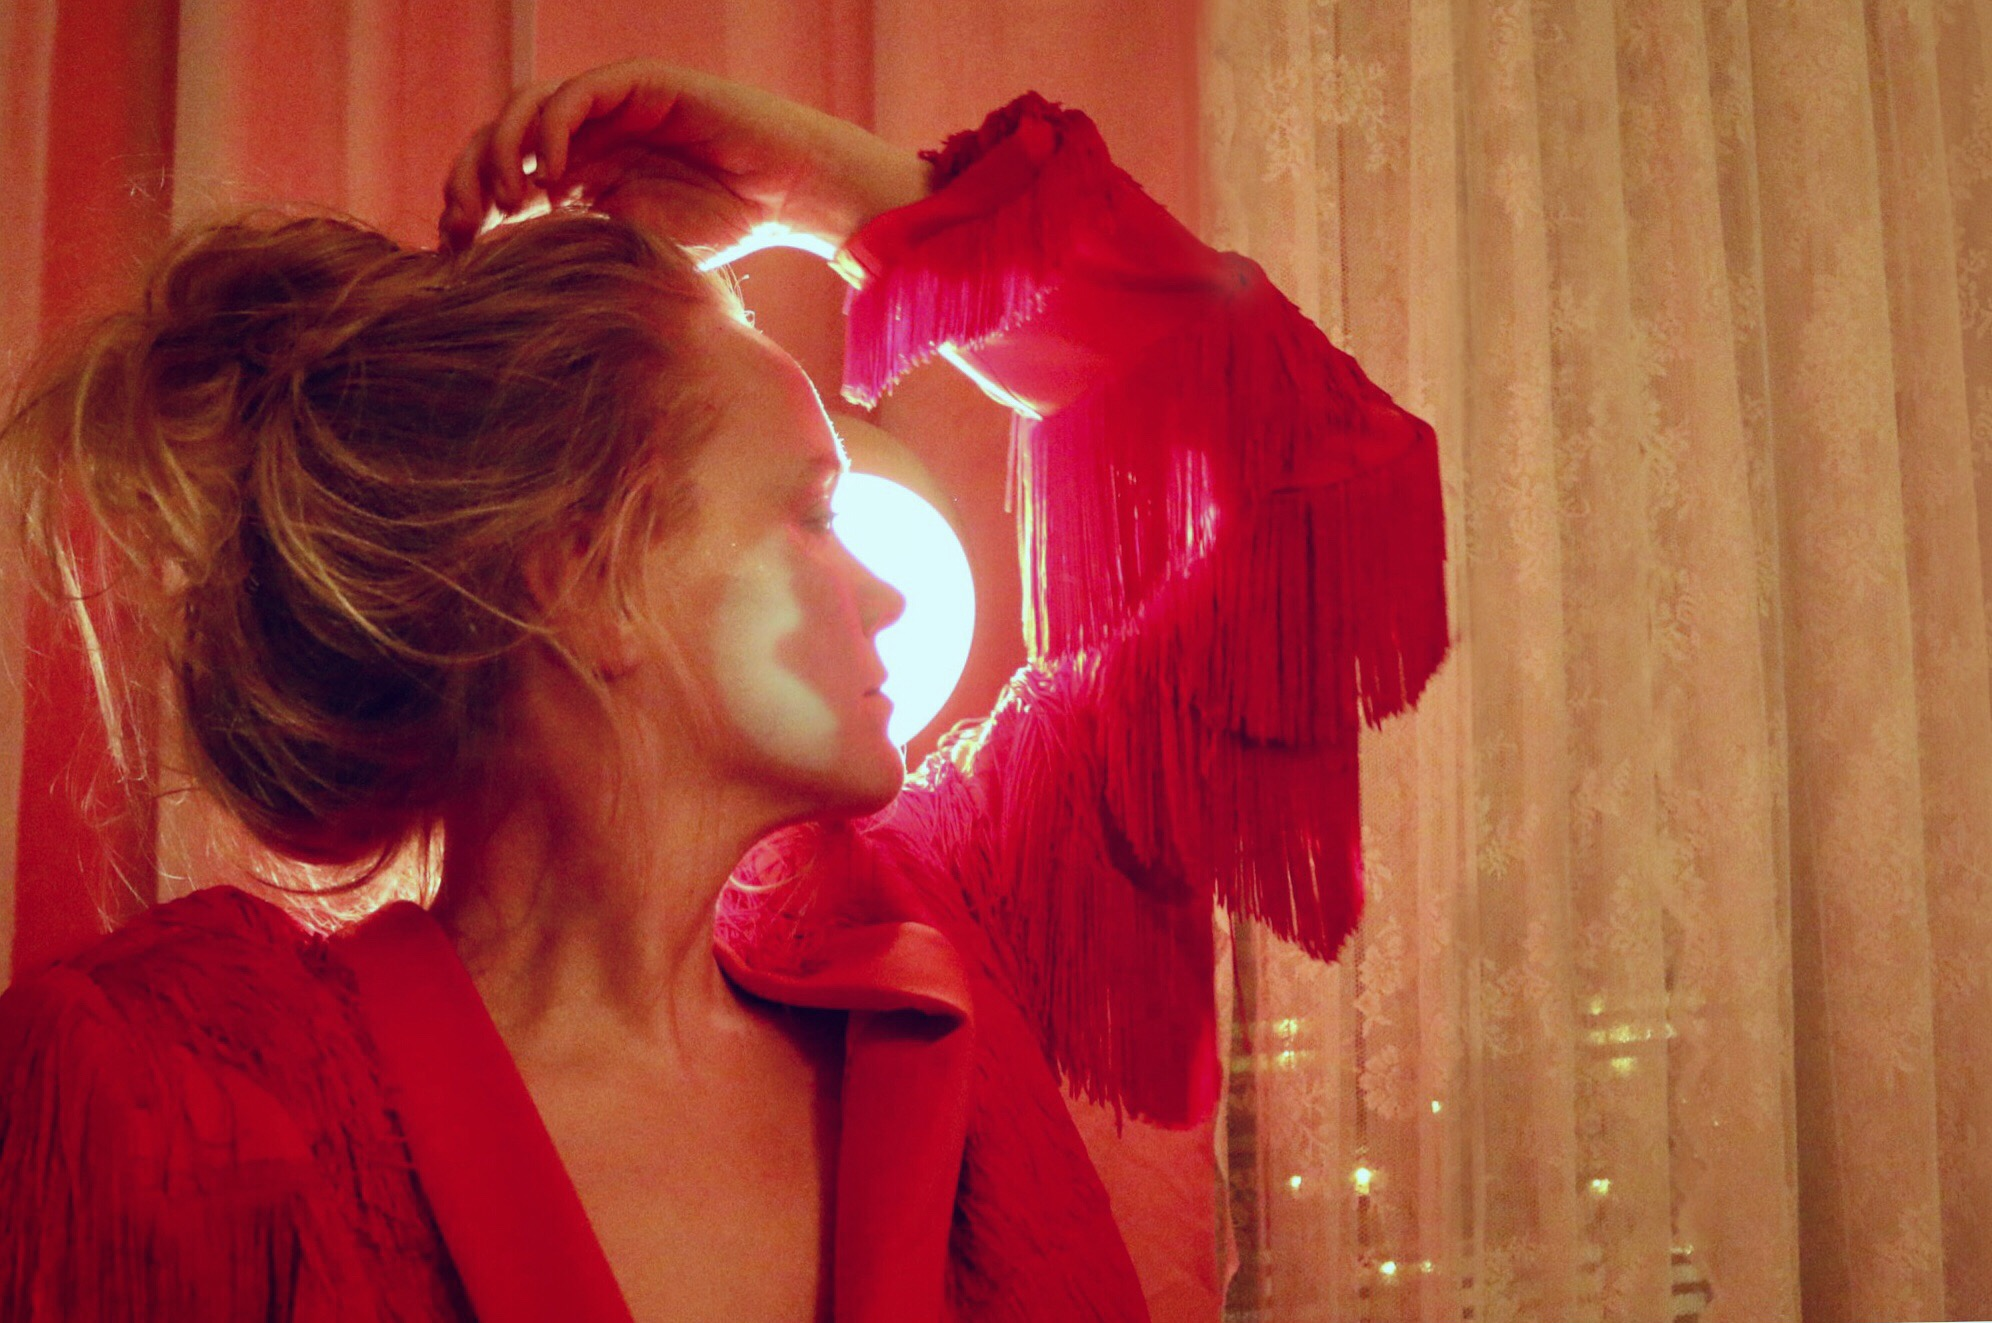 { Moondance } Ane Brun (2018)